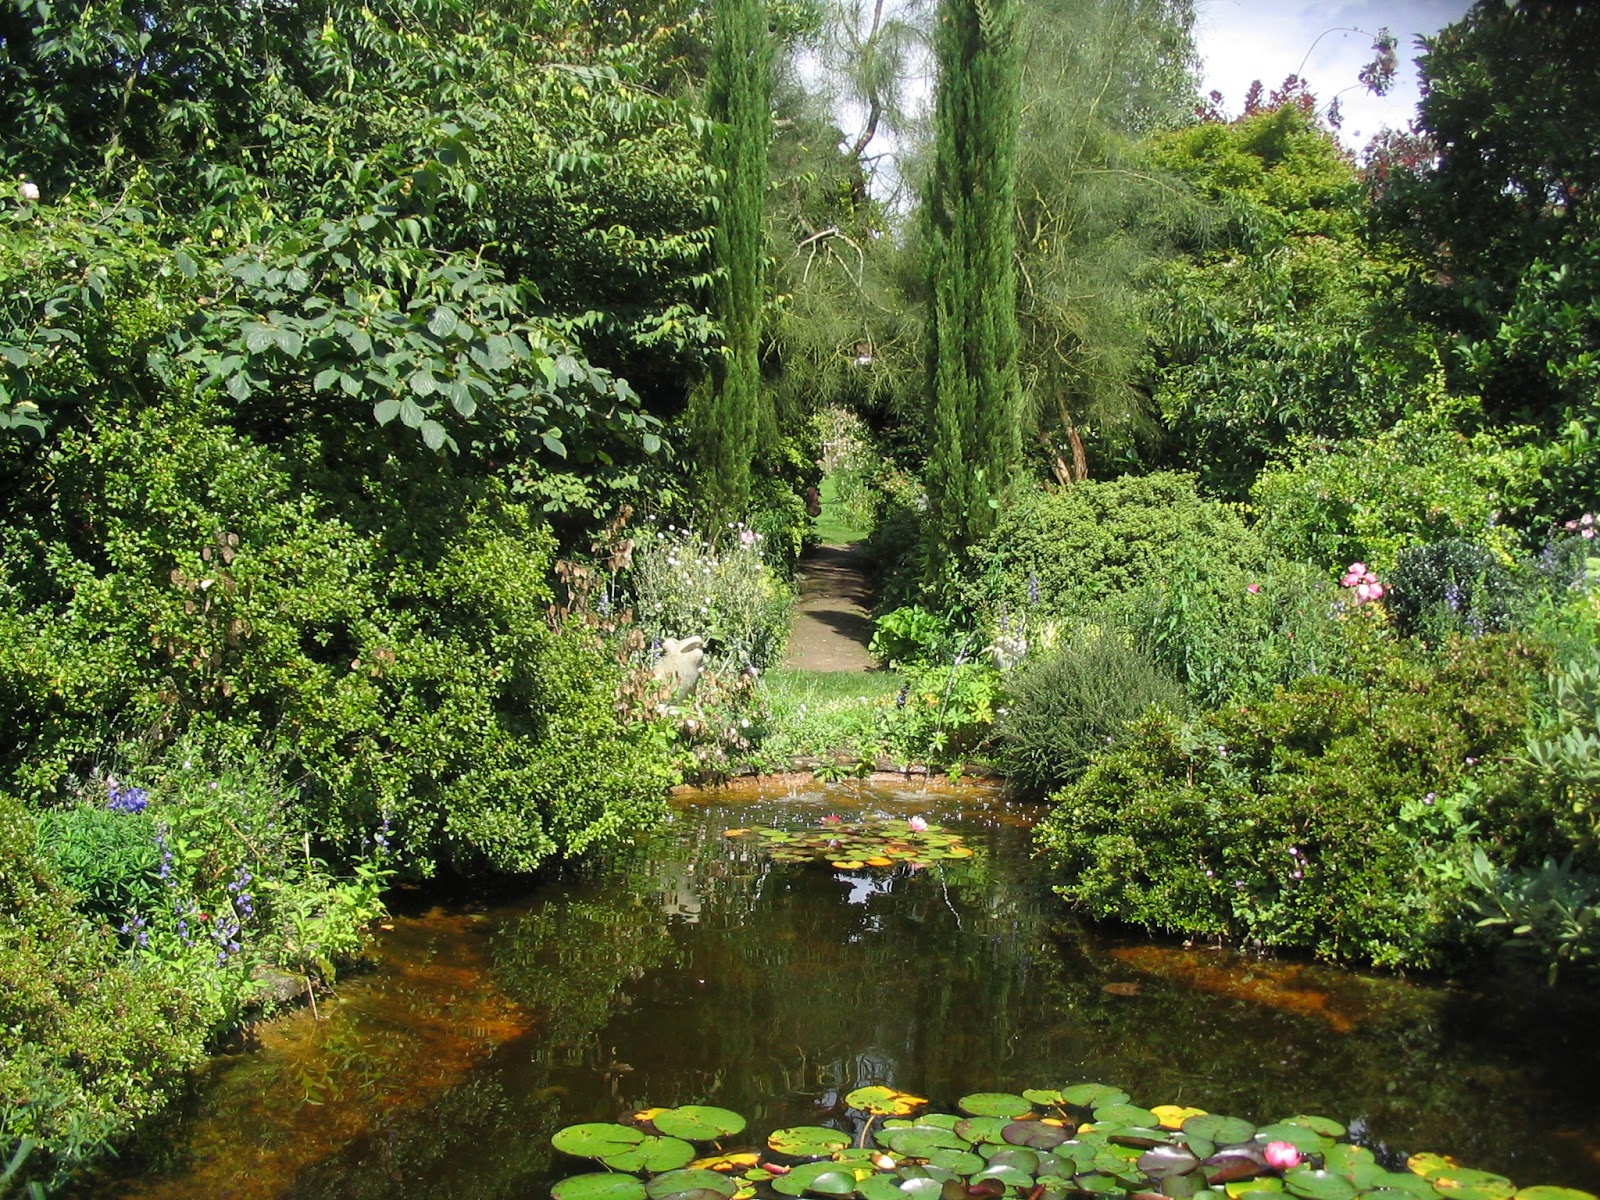 Le jardin de brigitte alsace jardin de la petite rochelle - Petit jardin zen interieur la rochelle ...